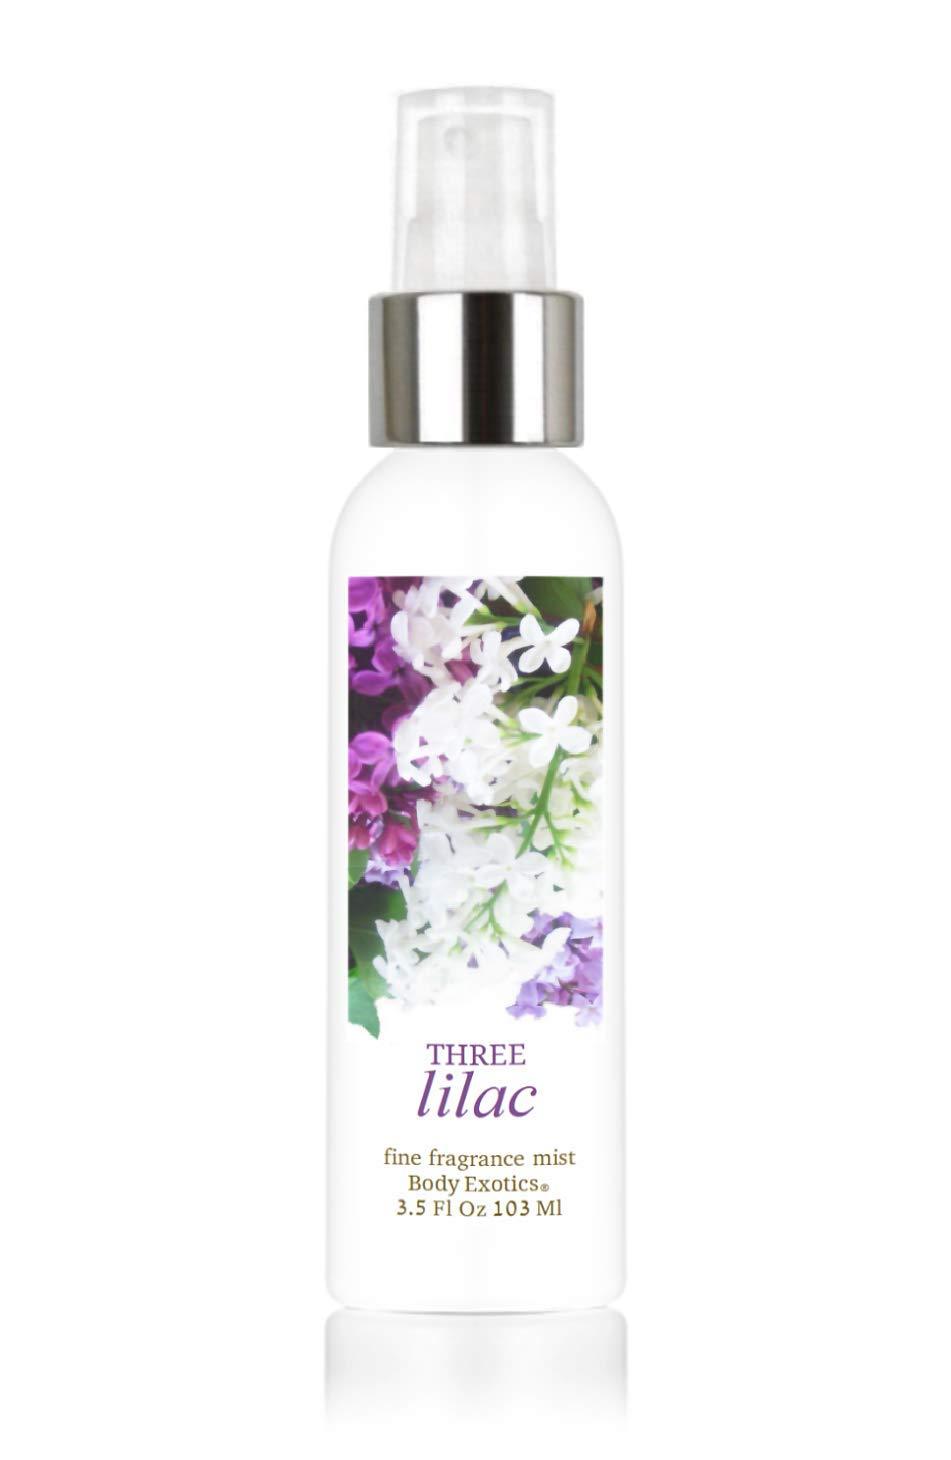 Three Lilac Perfume Fine Fragrance Mist by Body Exotics 3.5 Fl Oz 103 Ml ~ an Irresistible Blend of Light Purple, Dark & White Lilac Blossoms